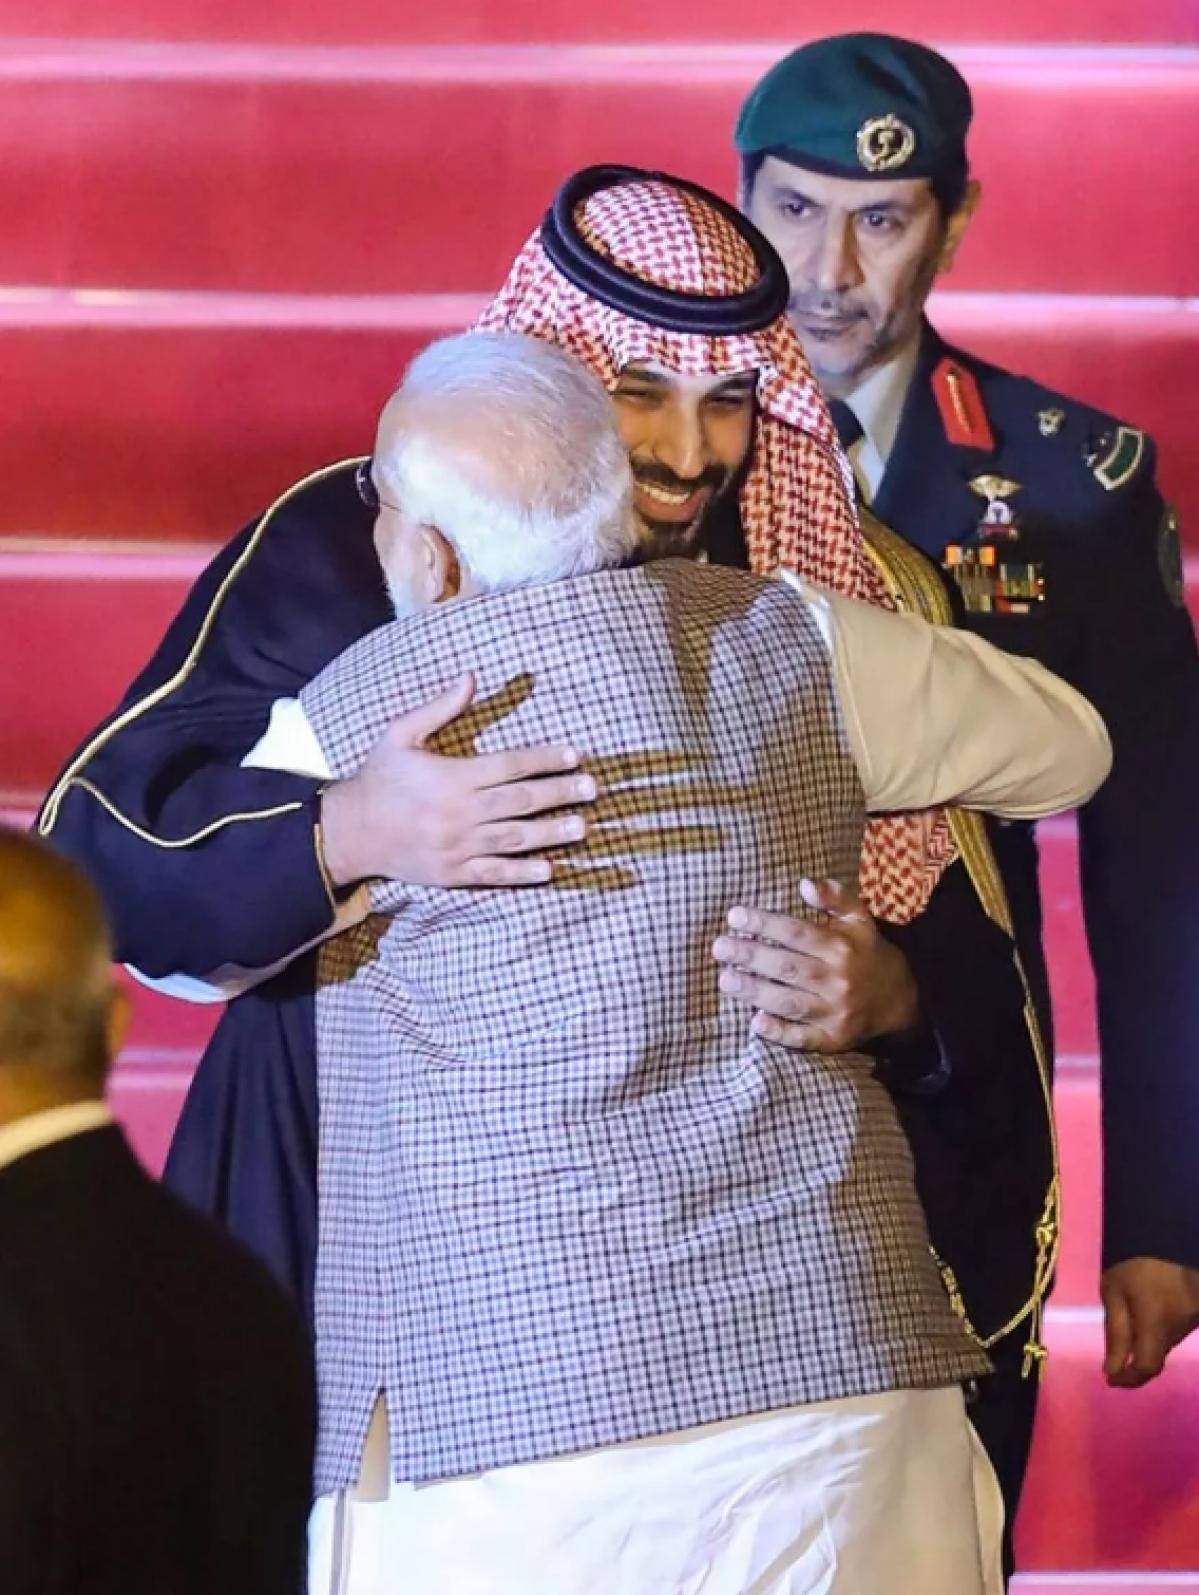 Narendra Modi greets the Crown Prince of Saudi Arabia, Mohammed bin Salman in New Delhi on 19 February 2019